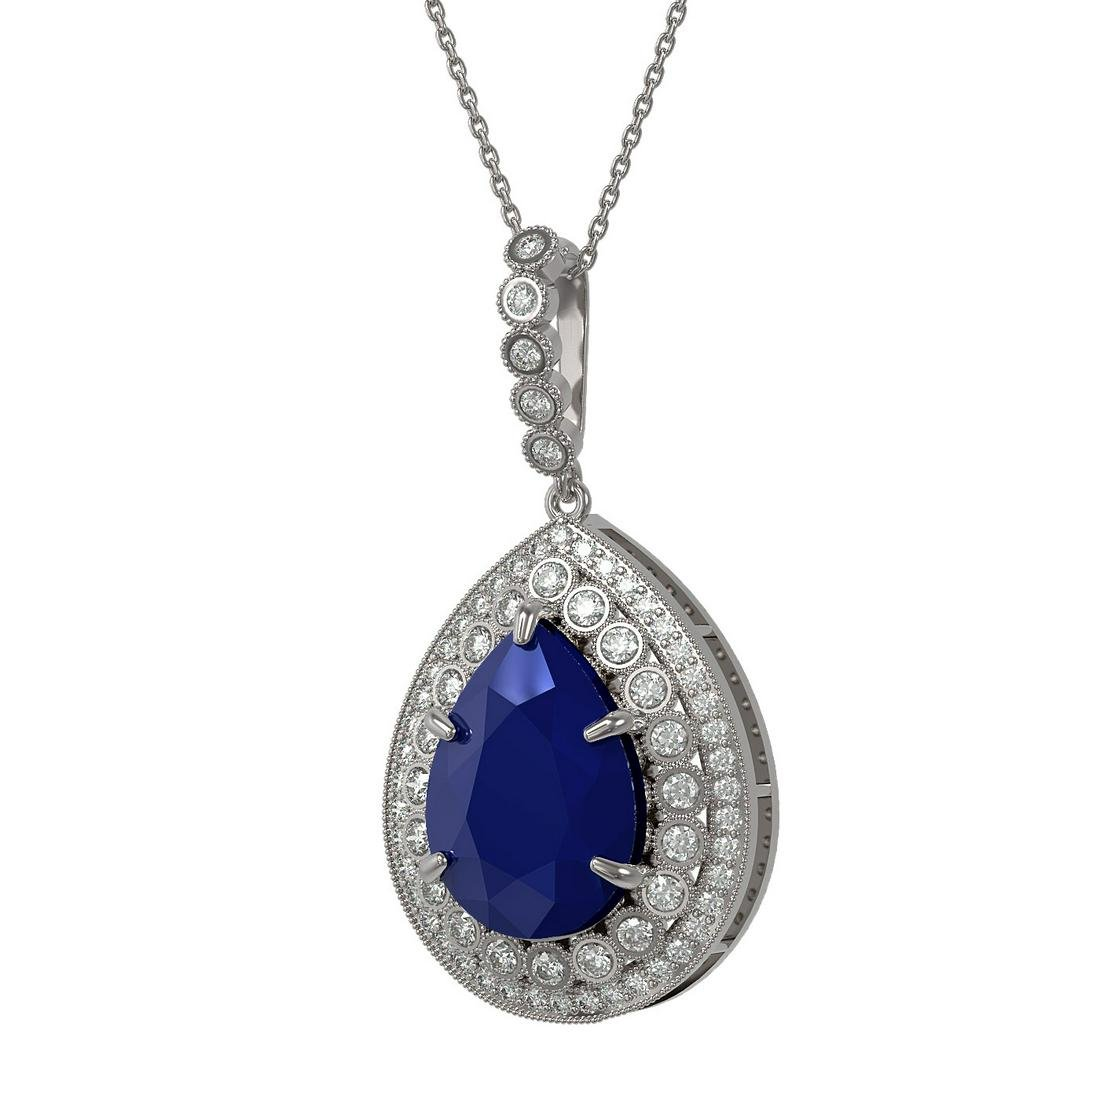 15.87 ctw Sapphire & Diamond Necklace 14K White Gold -